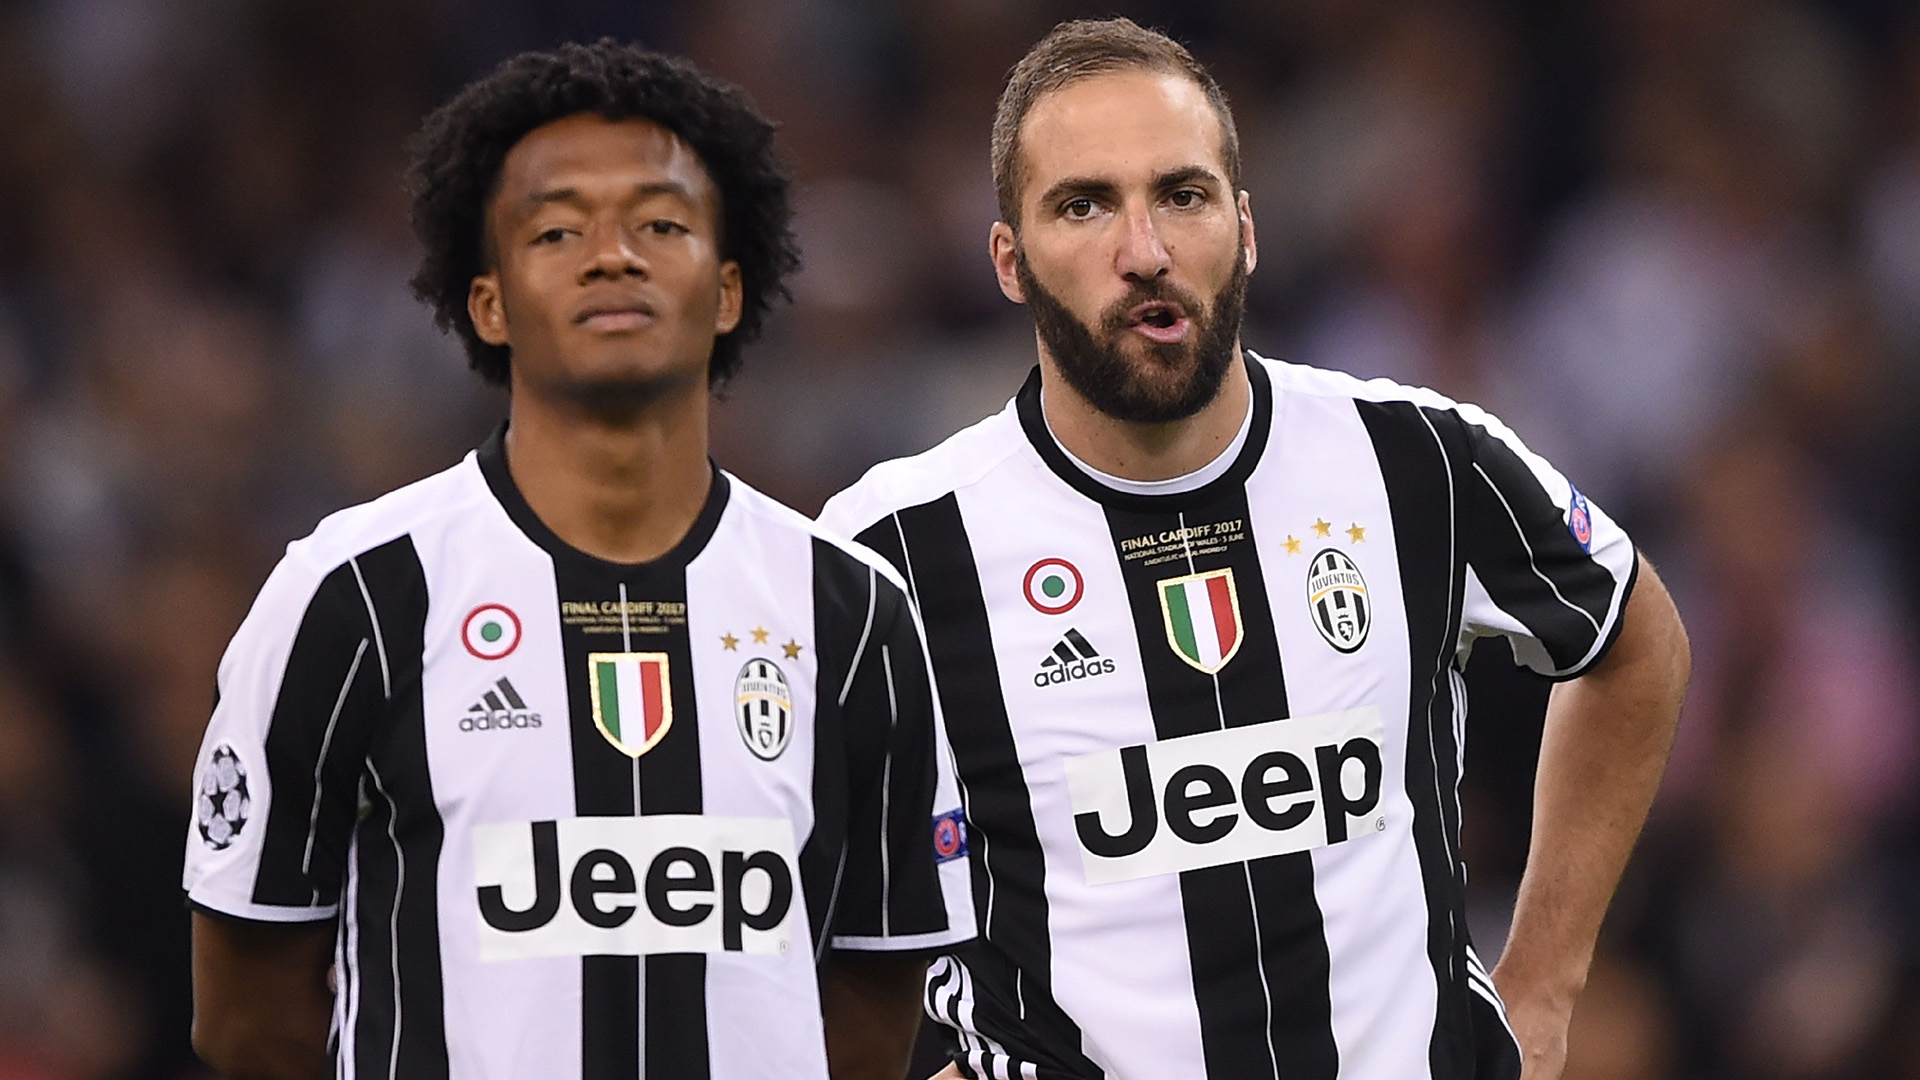 Cuadrado Higuain Juventus